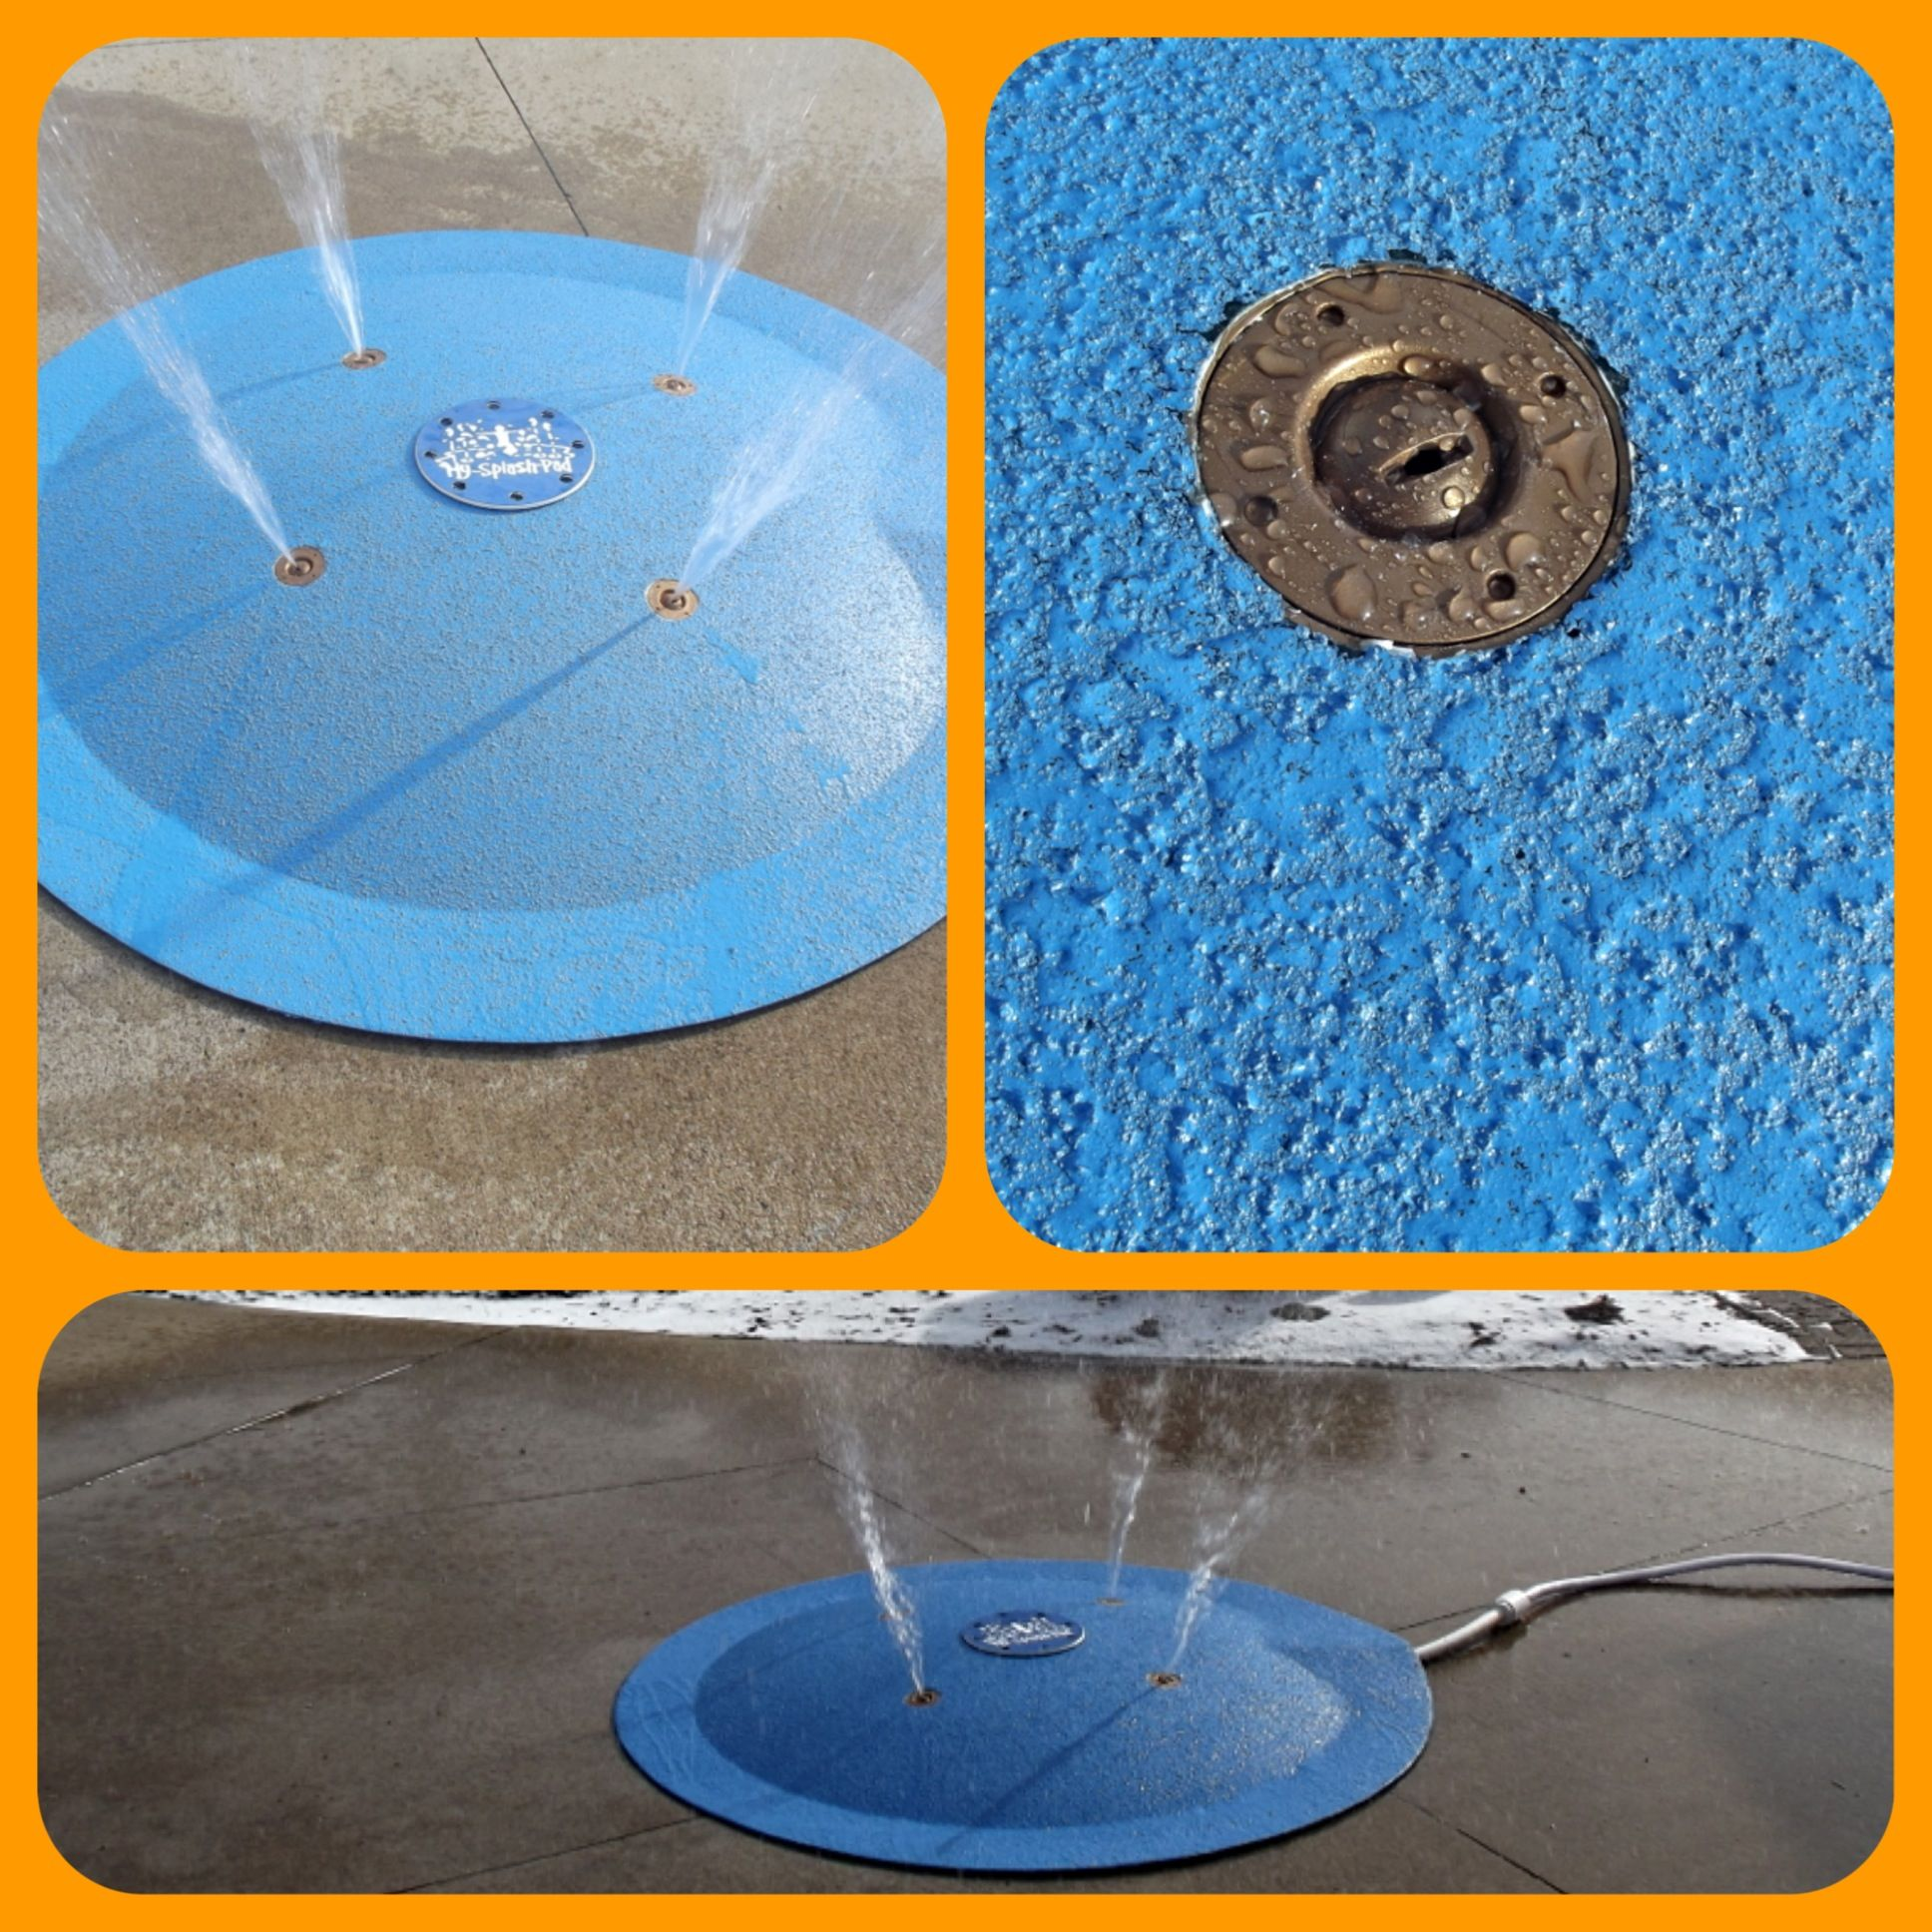 Diy Splash Pad For Dogs: My Splash Pad Portable Backyard Splash Pad!! Plug And Play